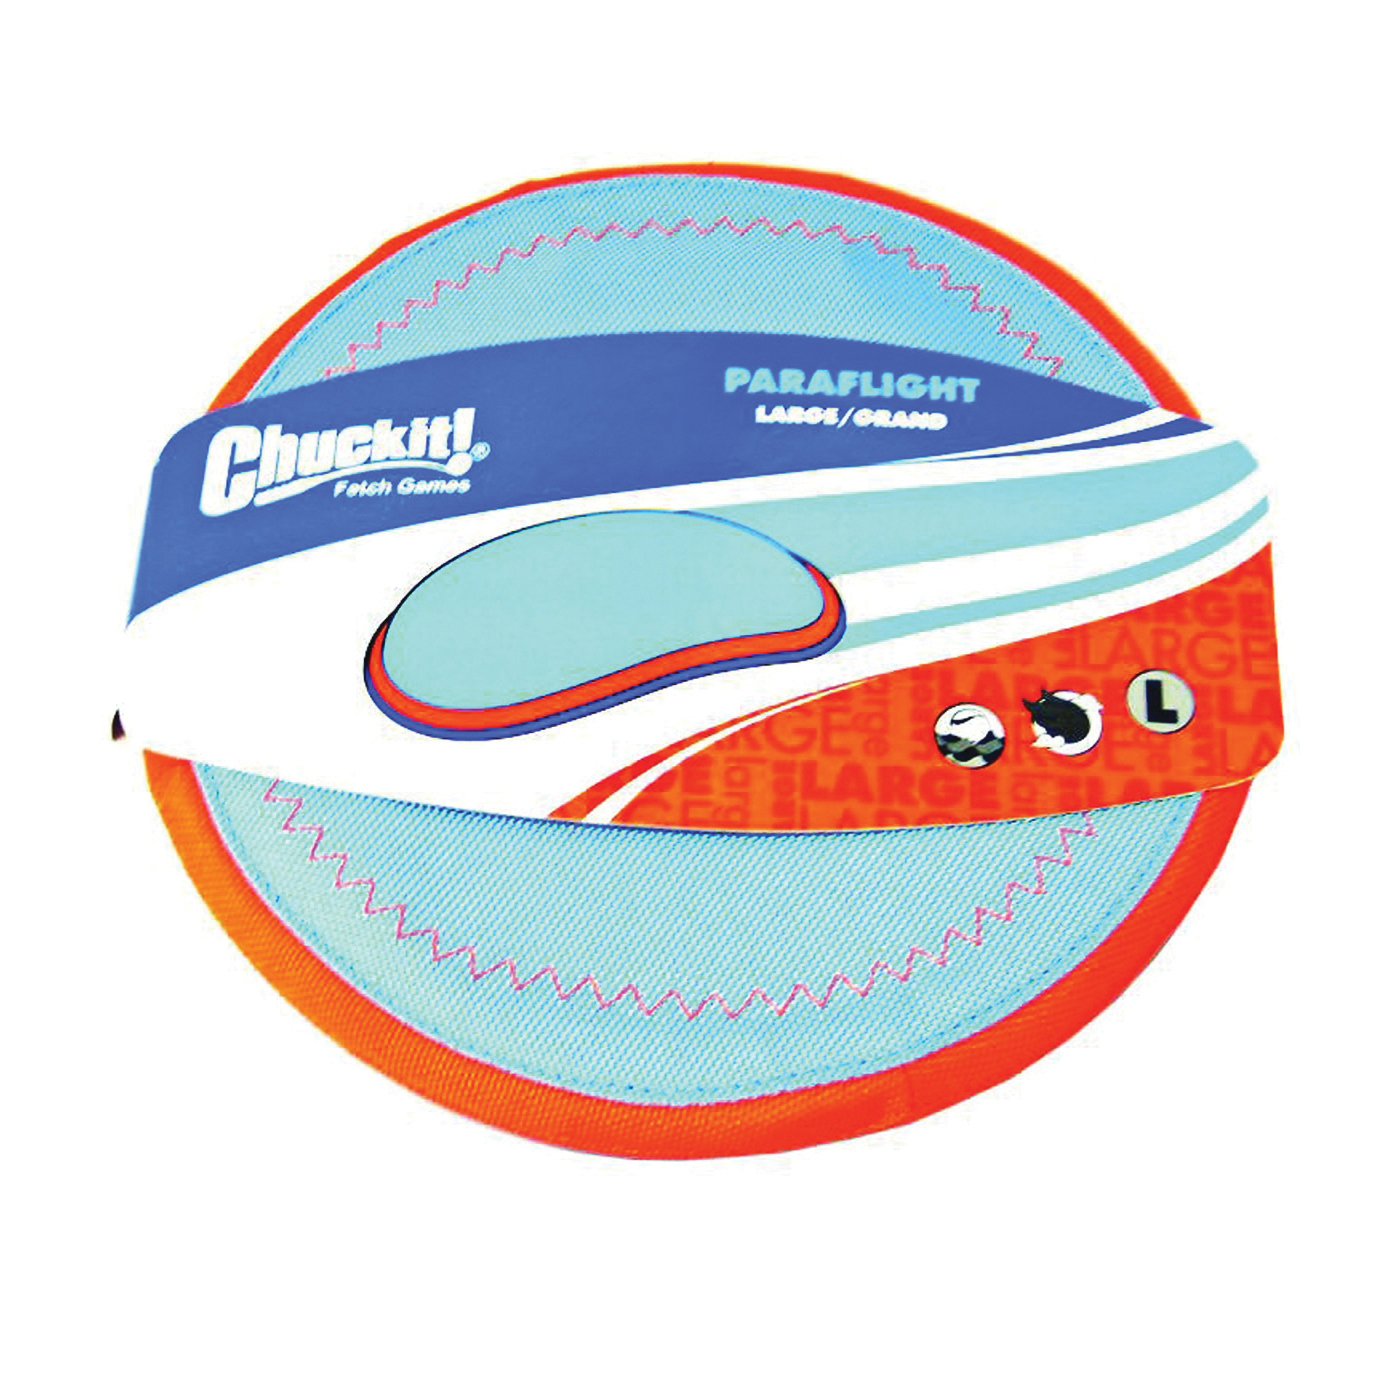 Picture of Chuckit! 221301 Paraflight Flyer, L, Nylon/Rubber, Blue/Orange